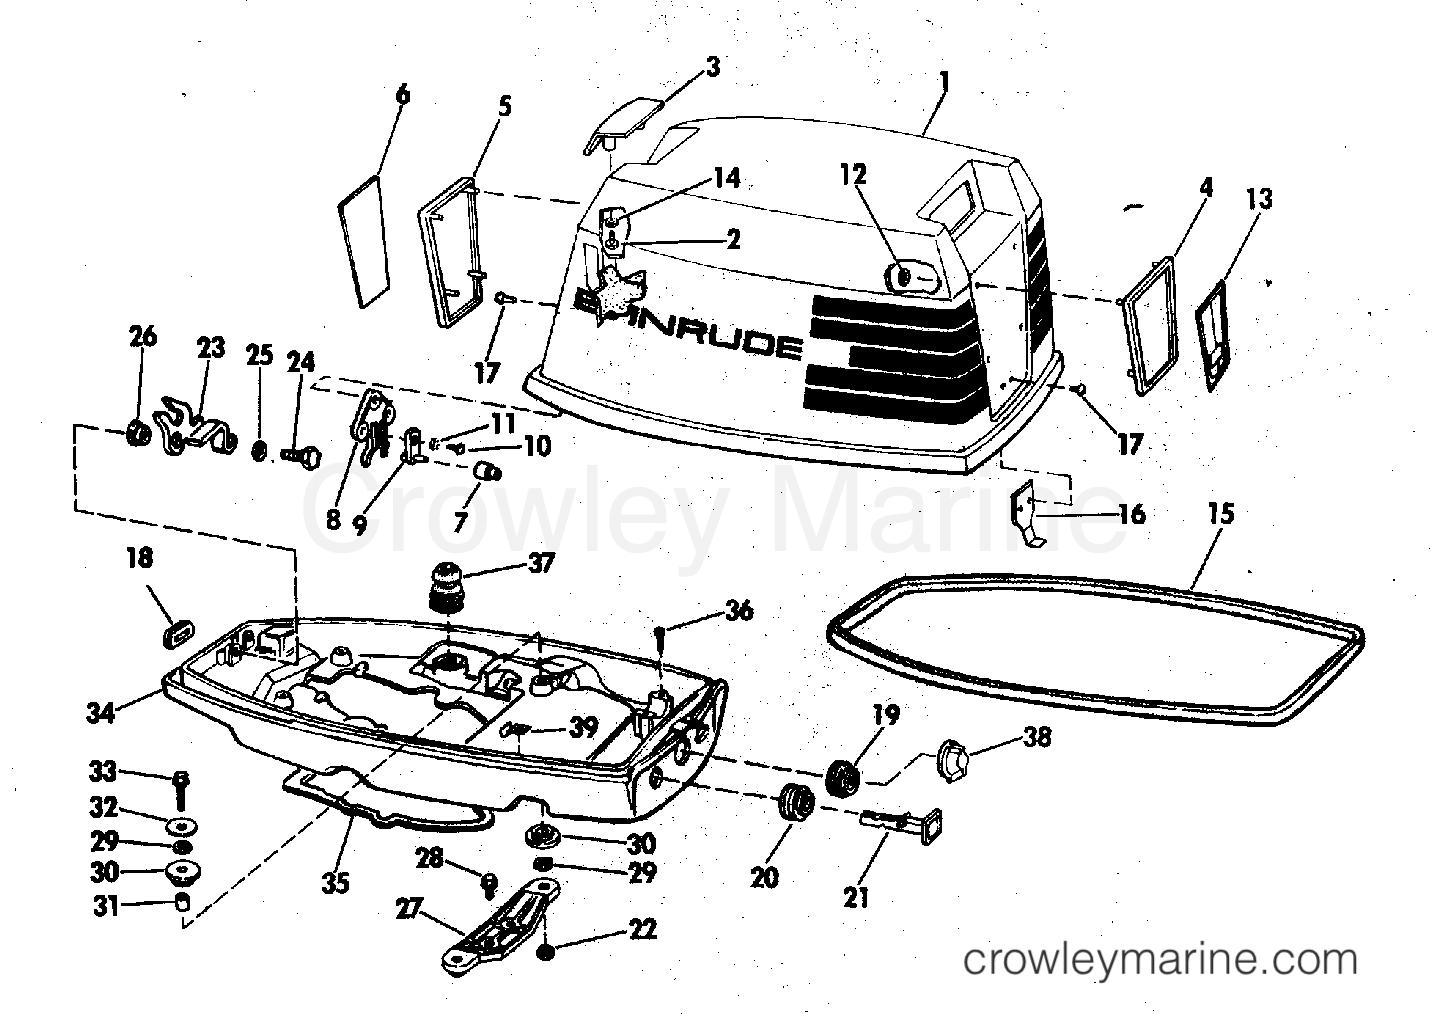 Evinrude Outboard Motor Diagram